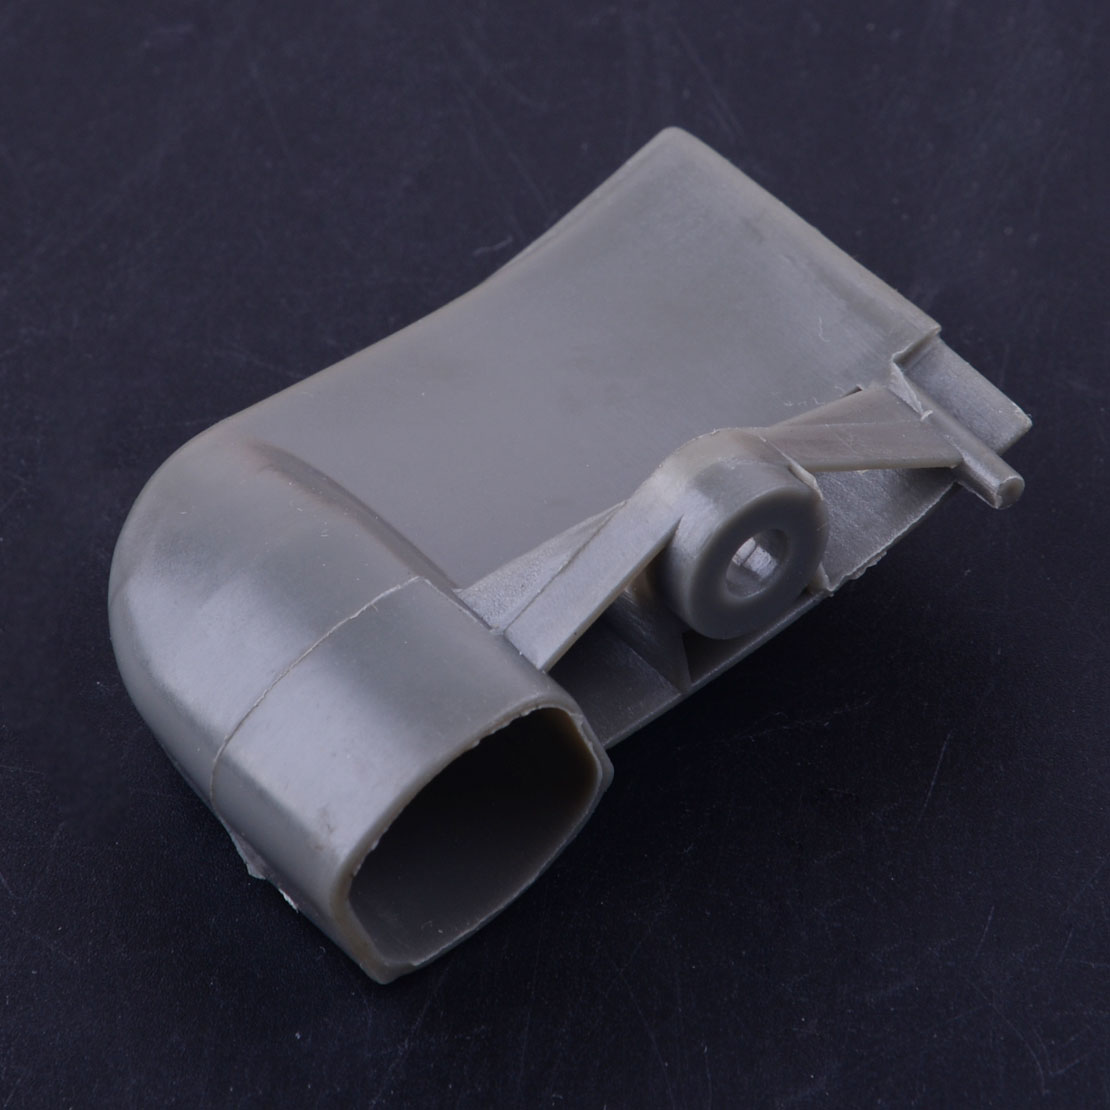 Jato plástico do tubo do defletor do ar 503 62 84-01 apto para husqvarna 372 371 365 362 jonsered cs2171 acessórios